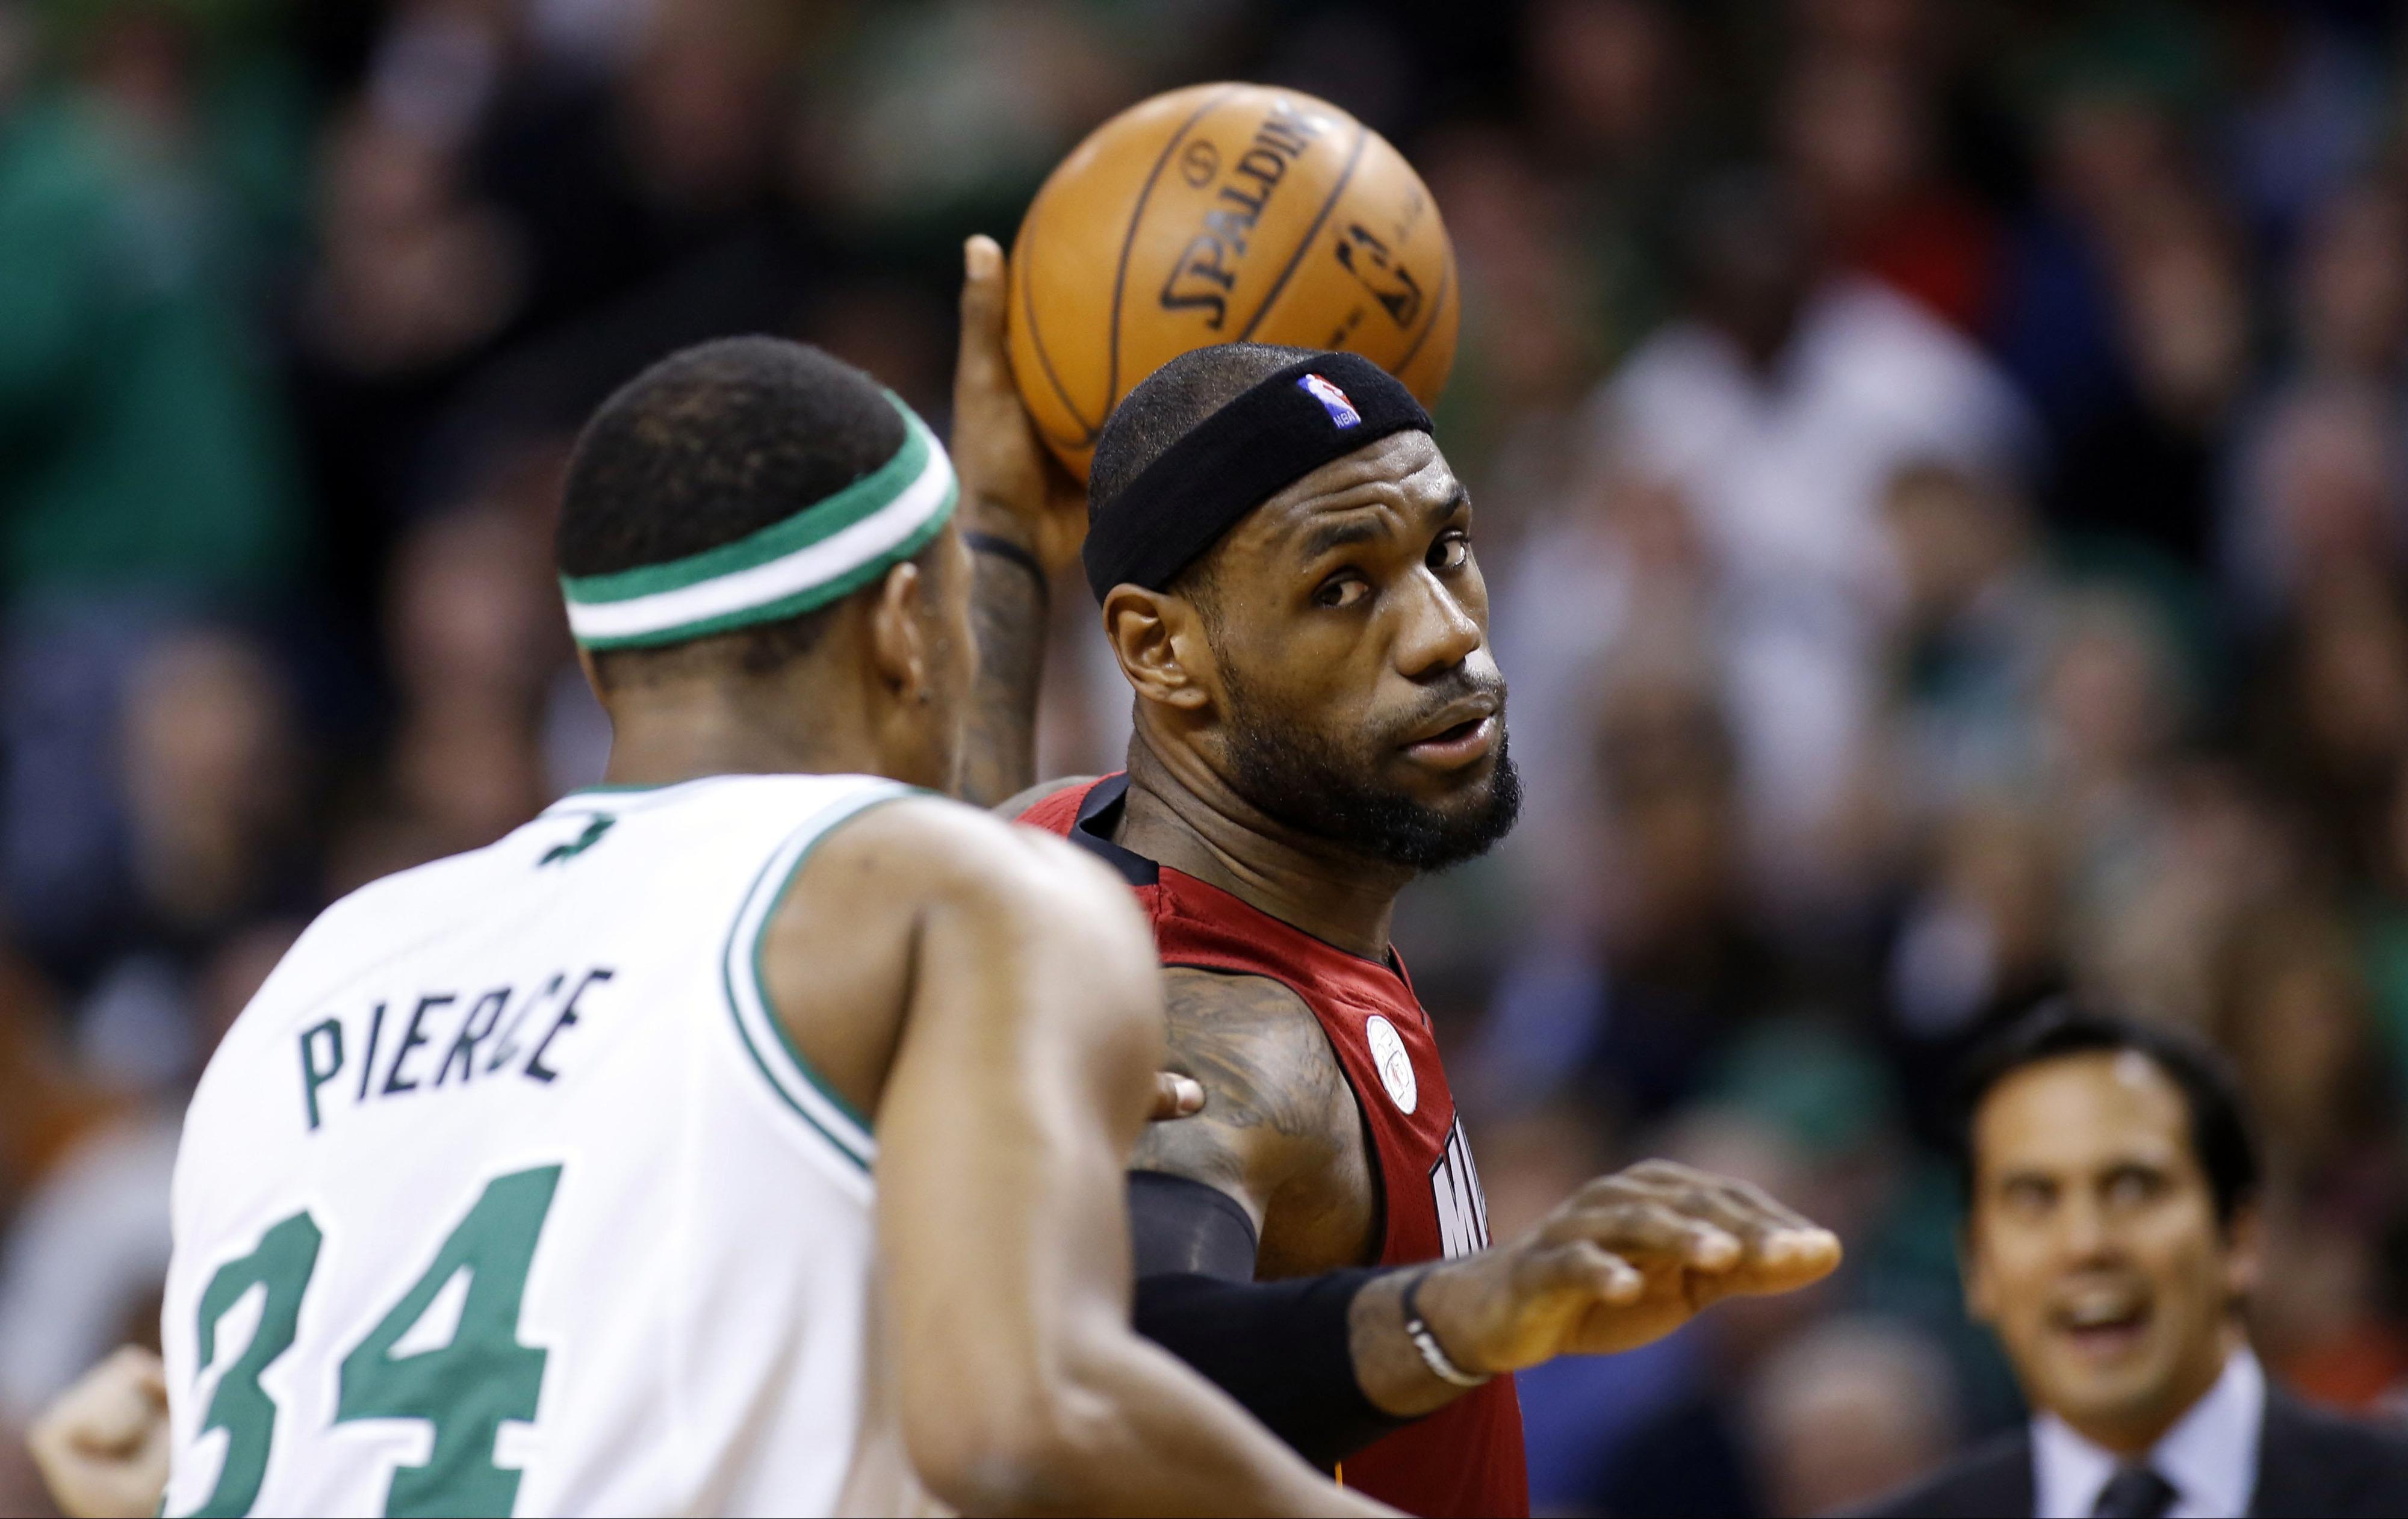 Heat winning streak survives Celtics' best effort, with history calling